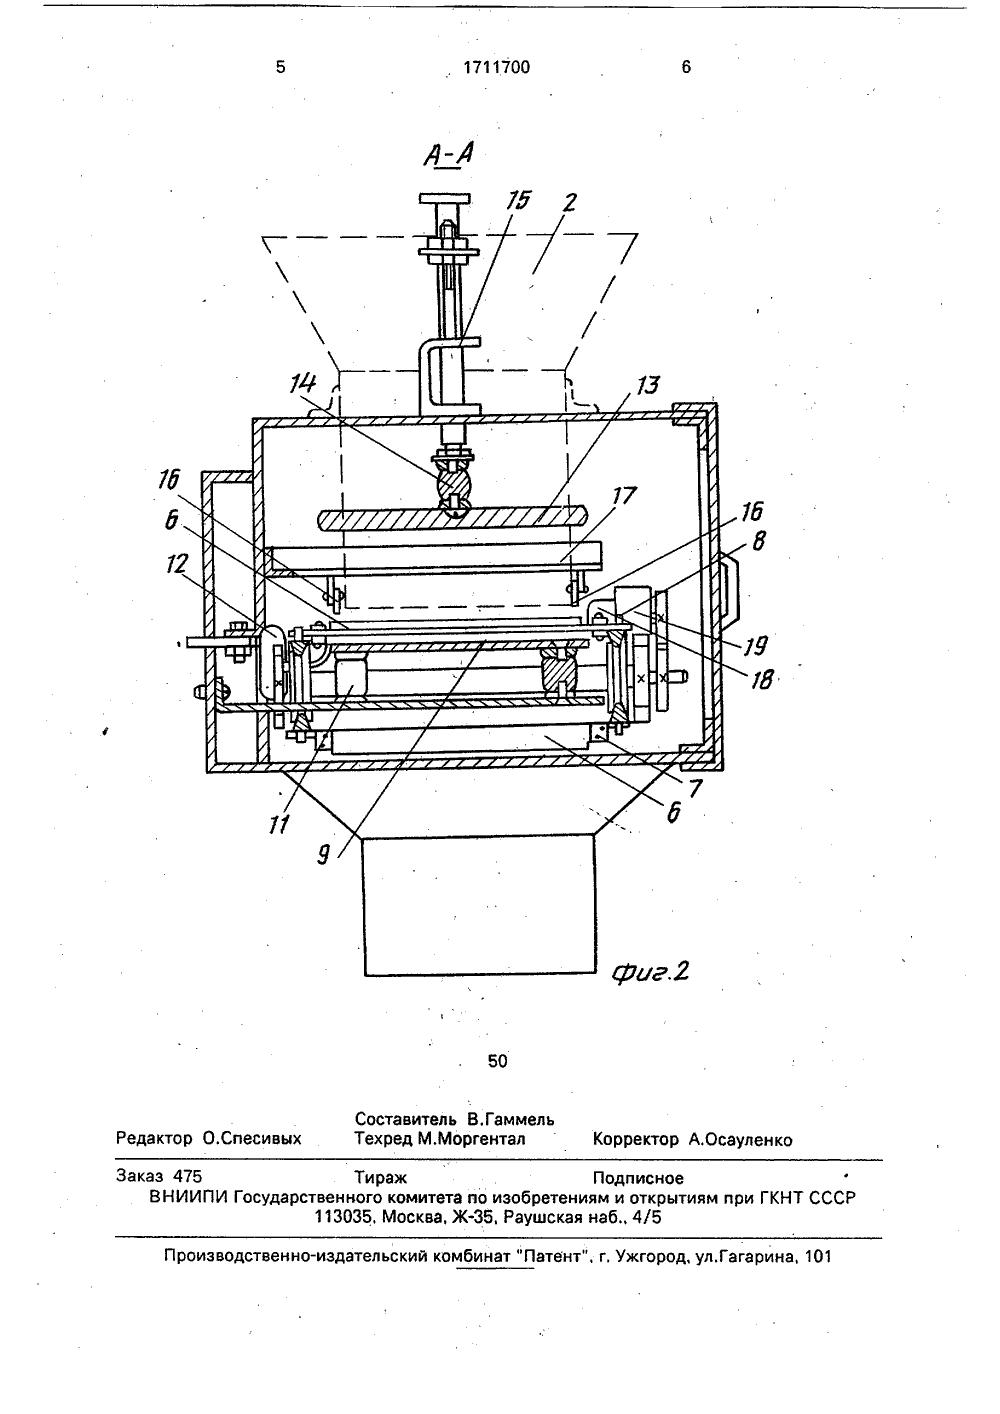 схема генератора эмпвч для семян